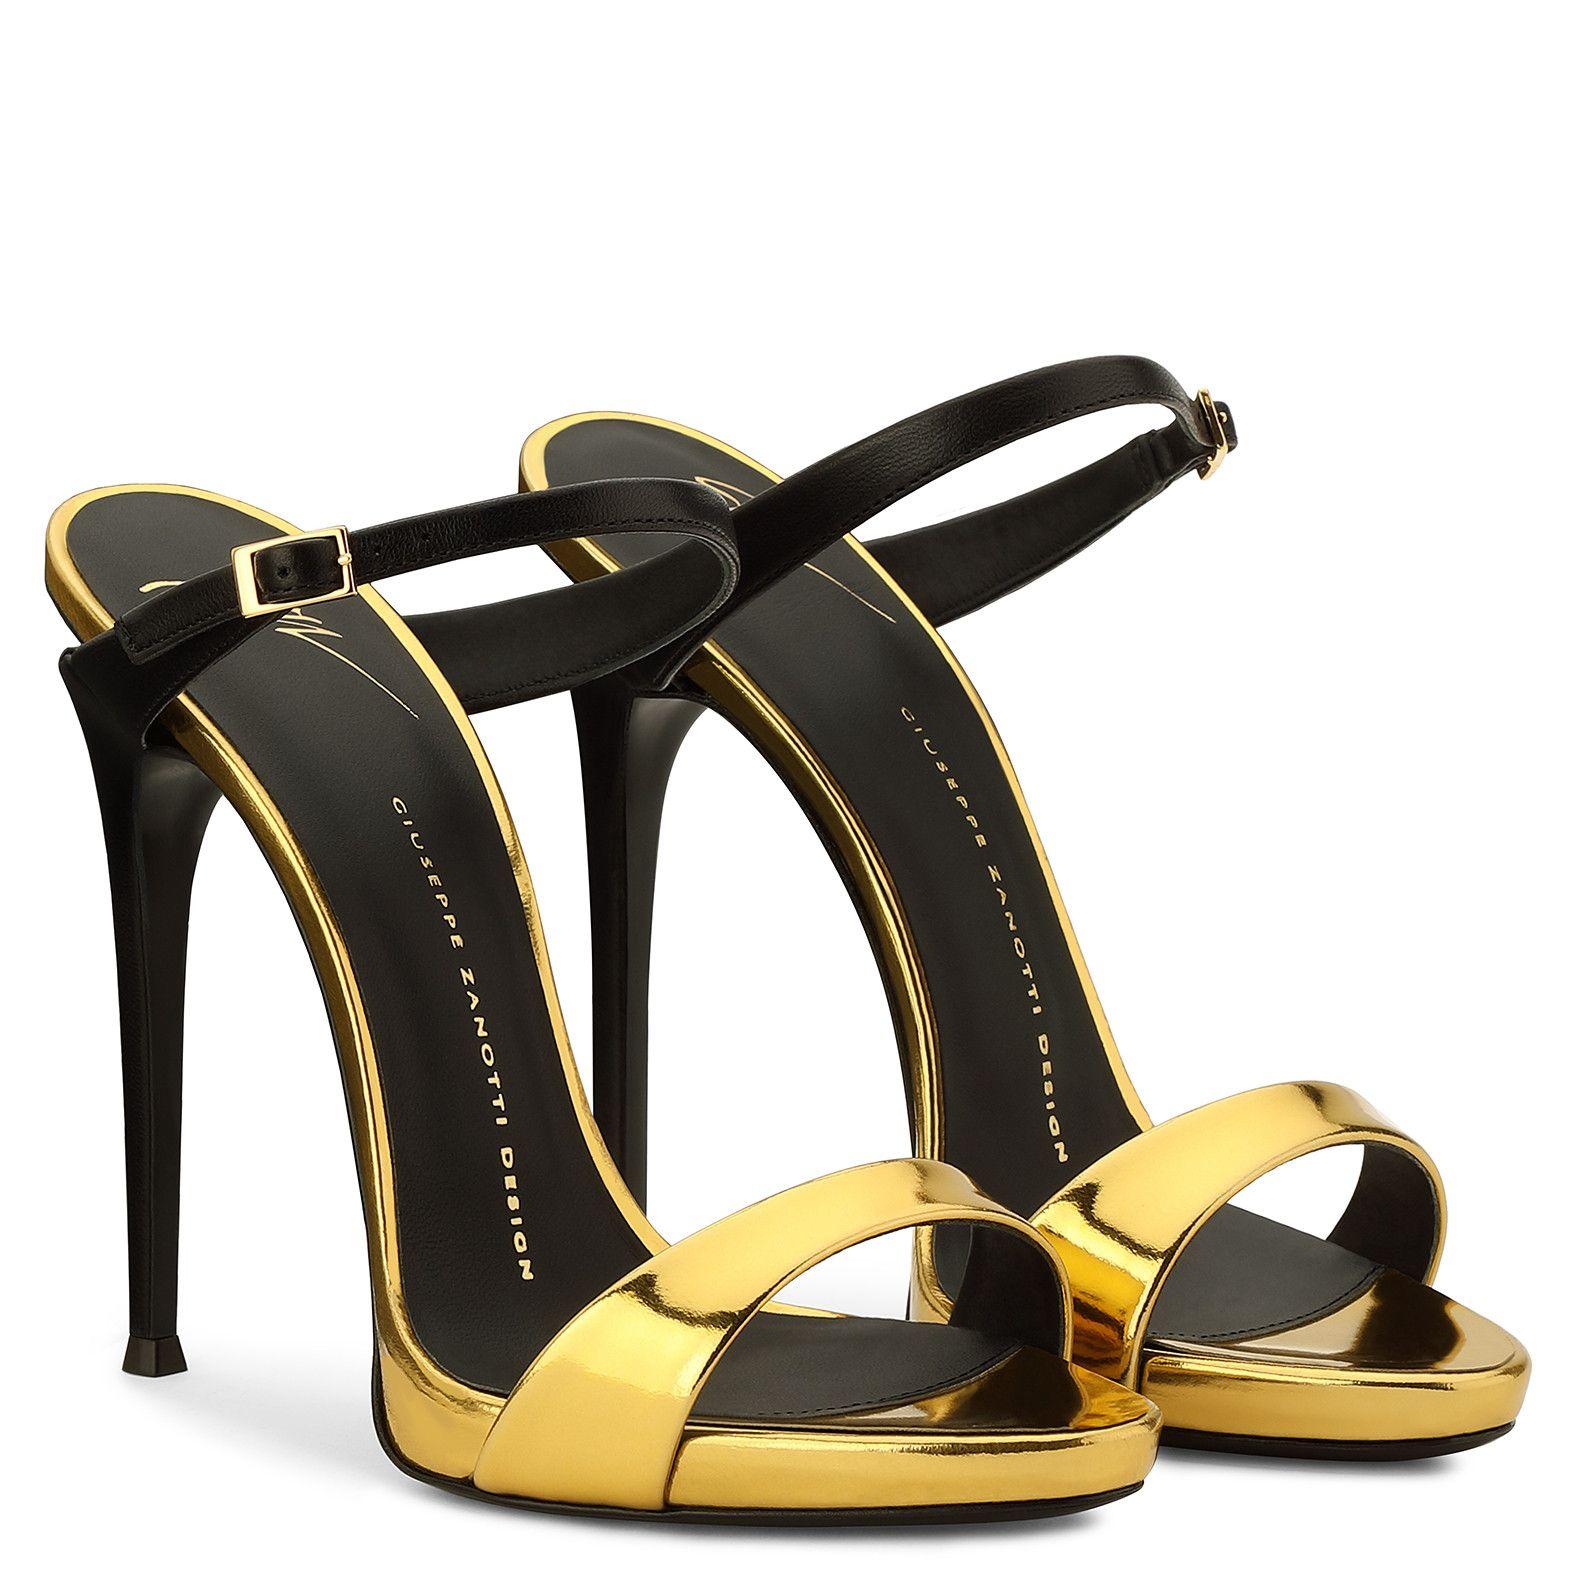 Tania Sandals Gold Giuseppe Zanotti Mules Shoes Sandals Giuseppe Zanotti